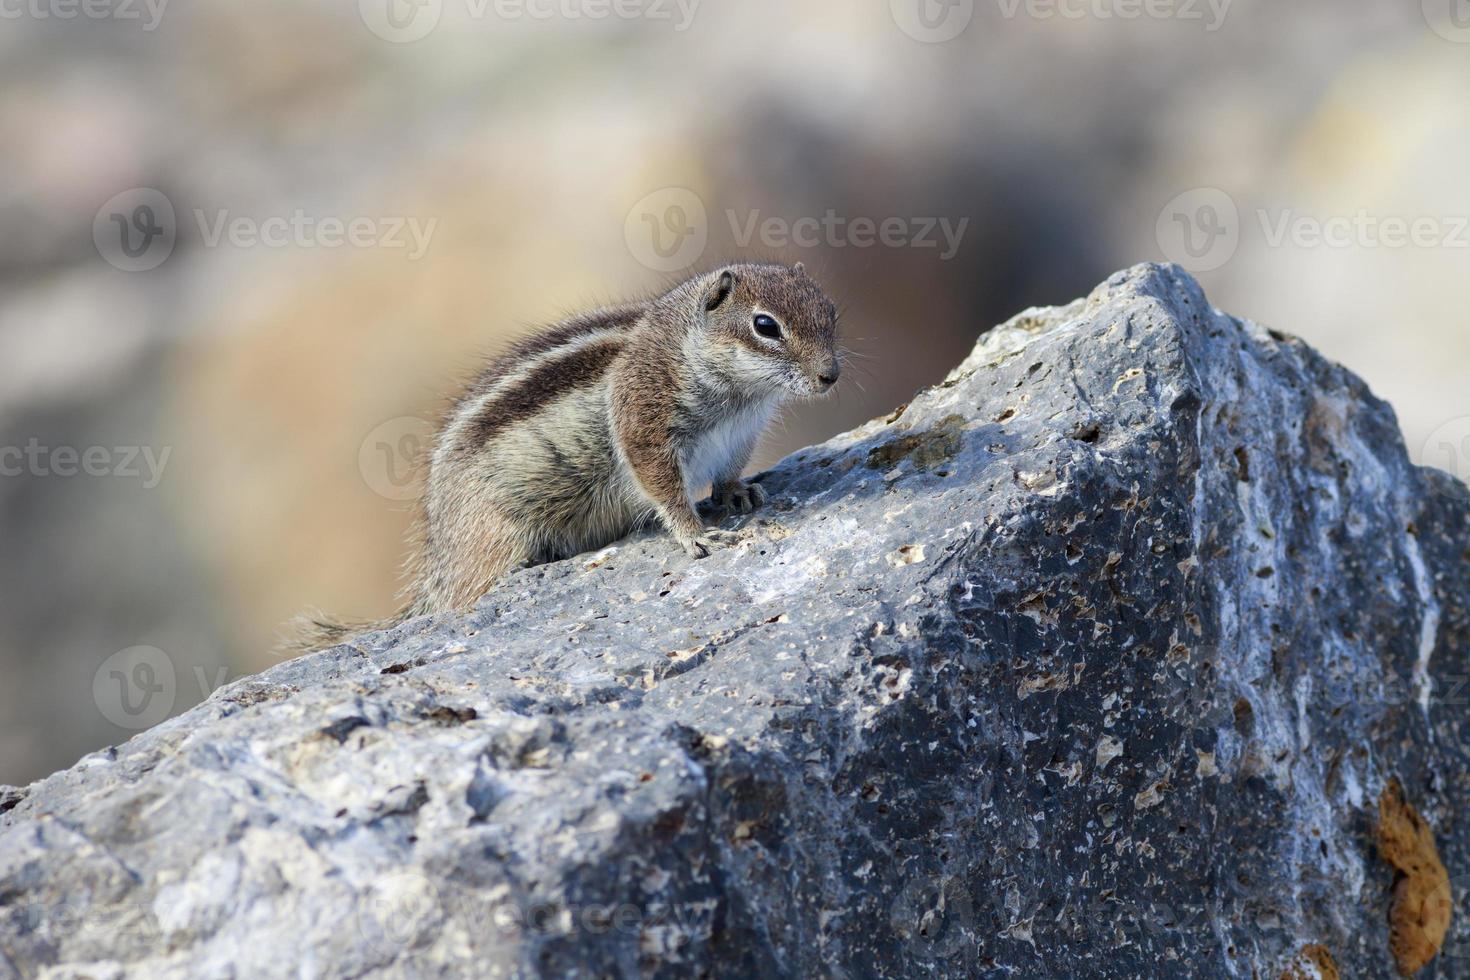 barbarije grondeekhoorn (atlantoxerus getulus) foto